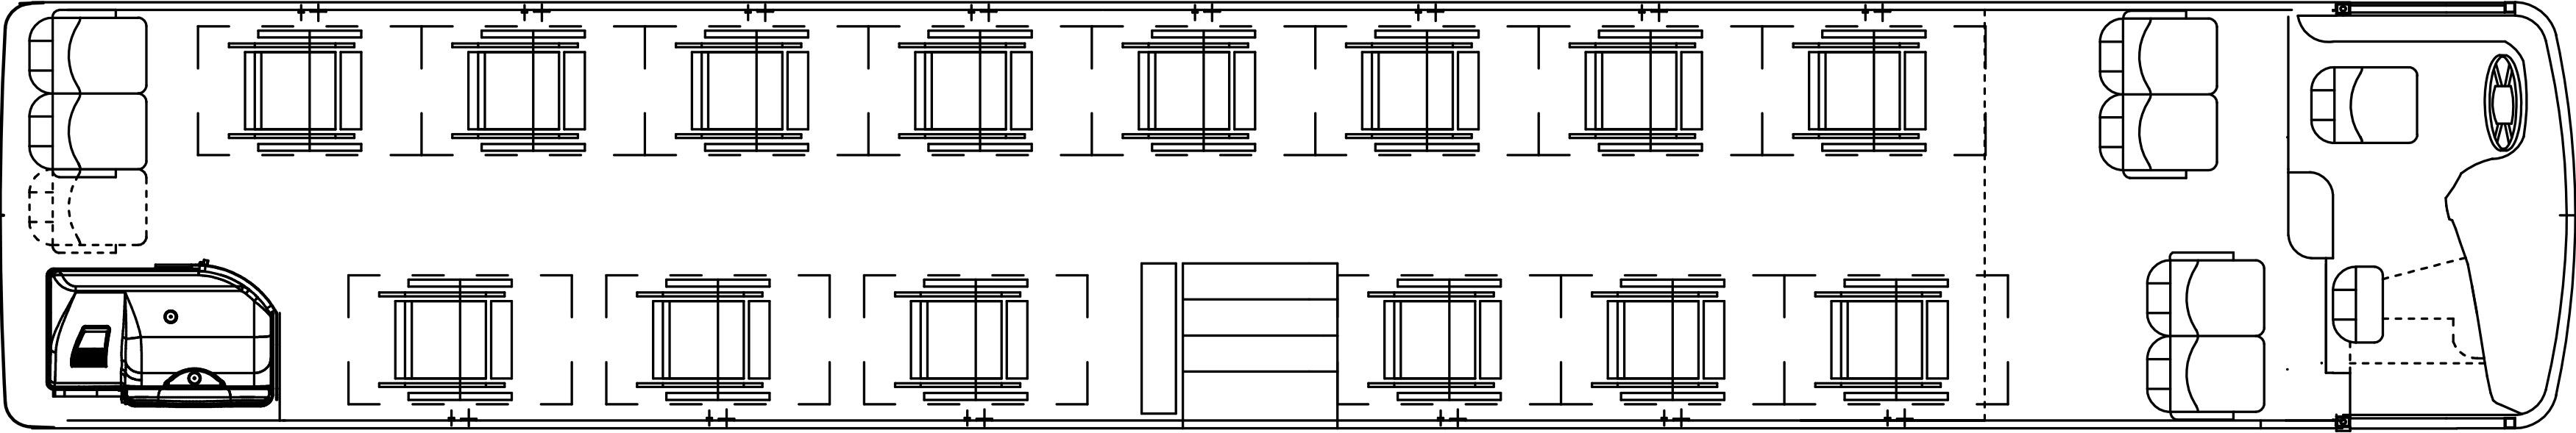 irizar i6 s sur ch ssis. Black Bedroom Furniture Sets. Home Design Ideas